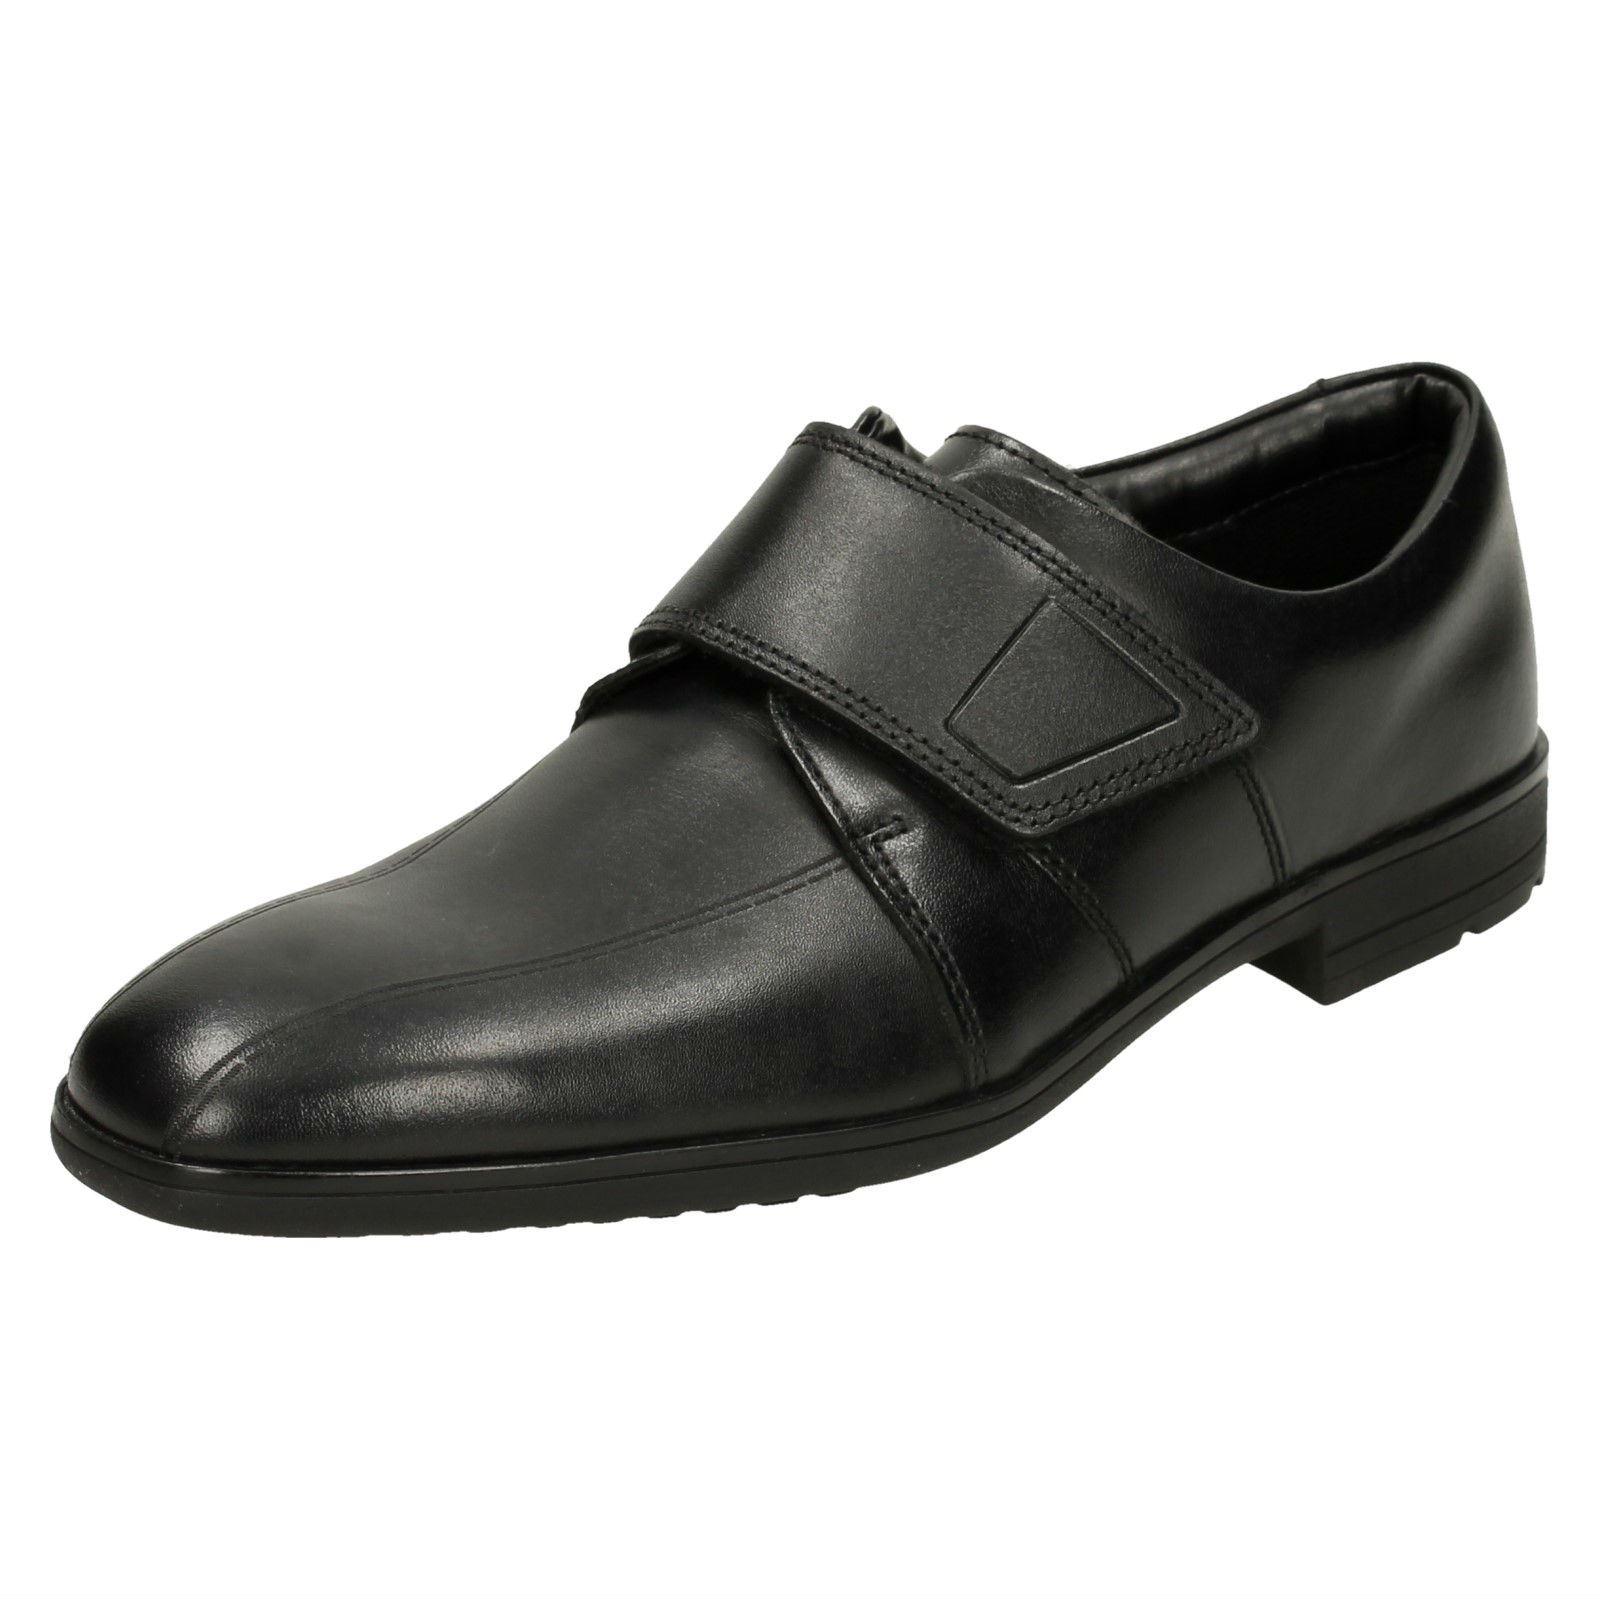 Boys Clarks Bootleg Hook /& Loop Leather Smart School Shoes Willis Time